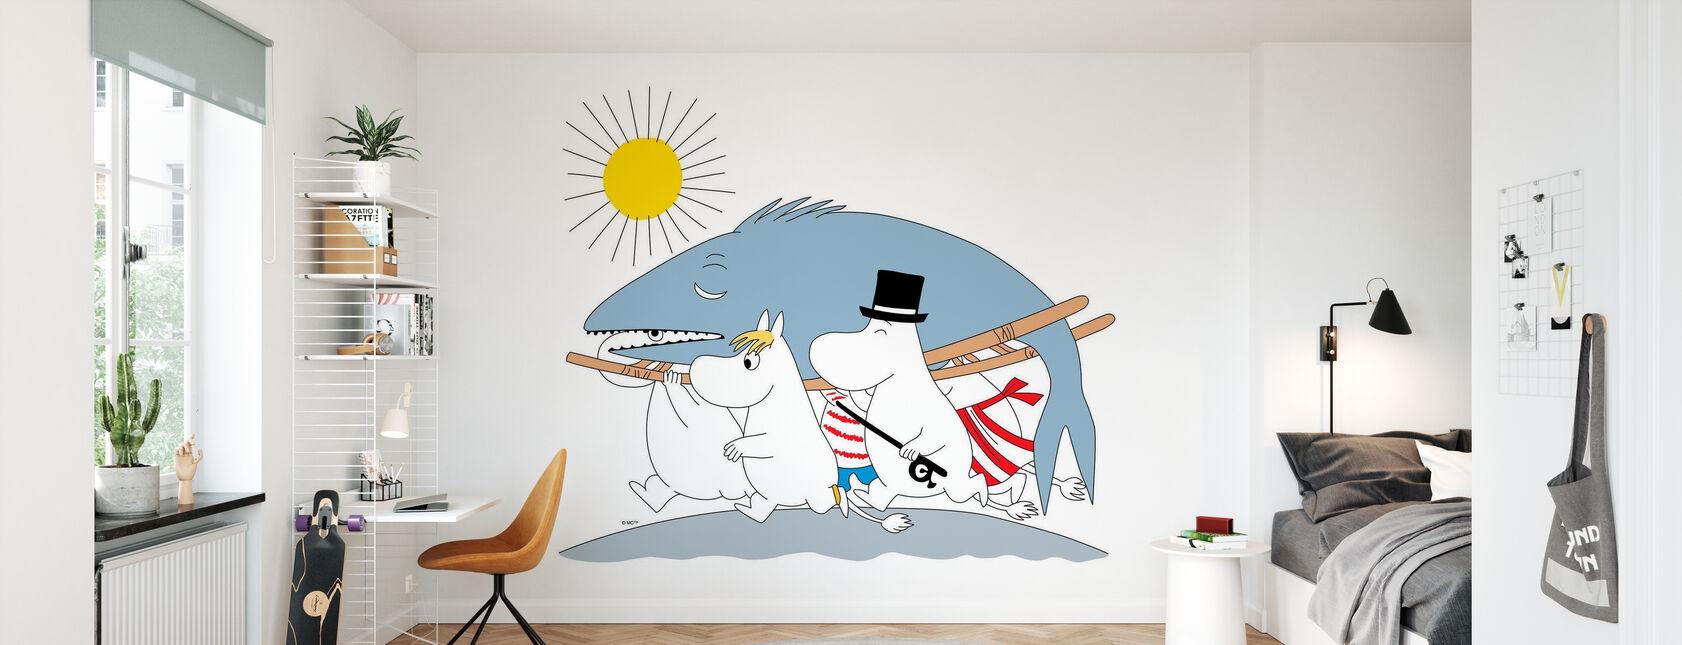 Moomin - Big Fish - Wallpaper - Kids Room